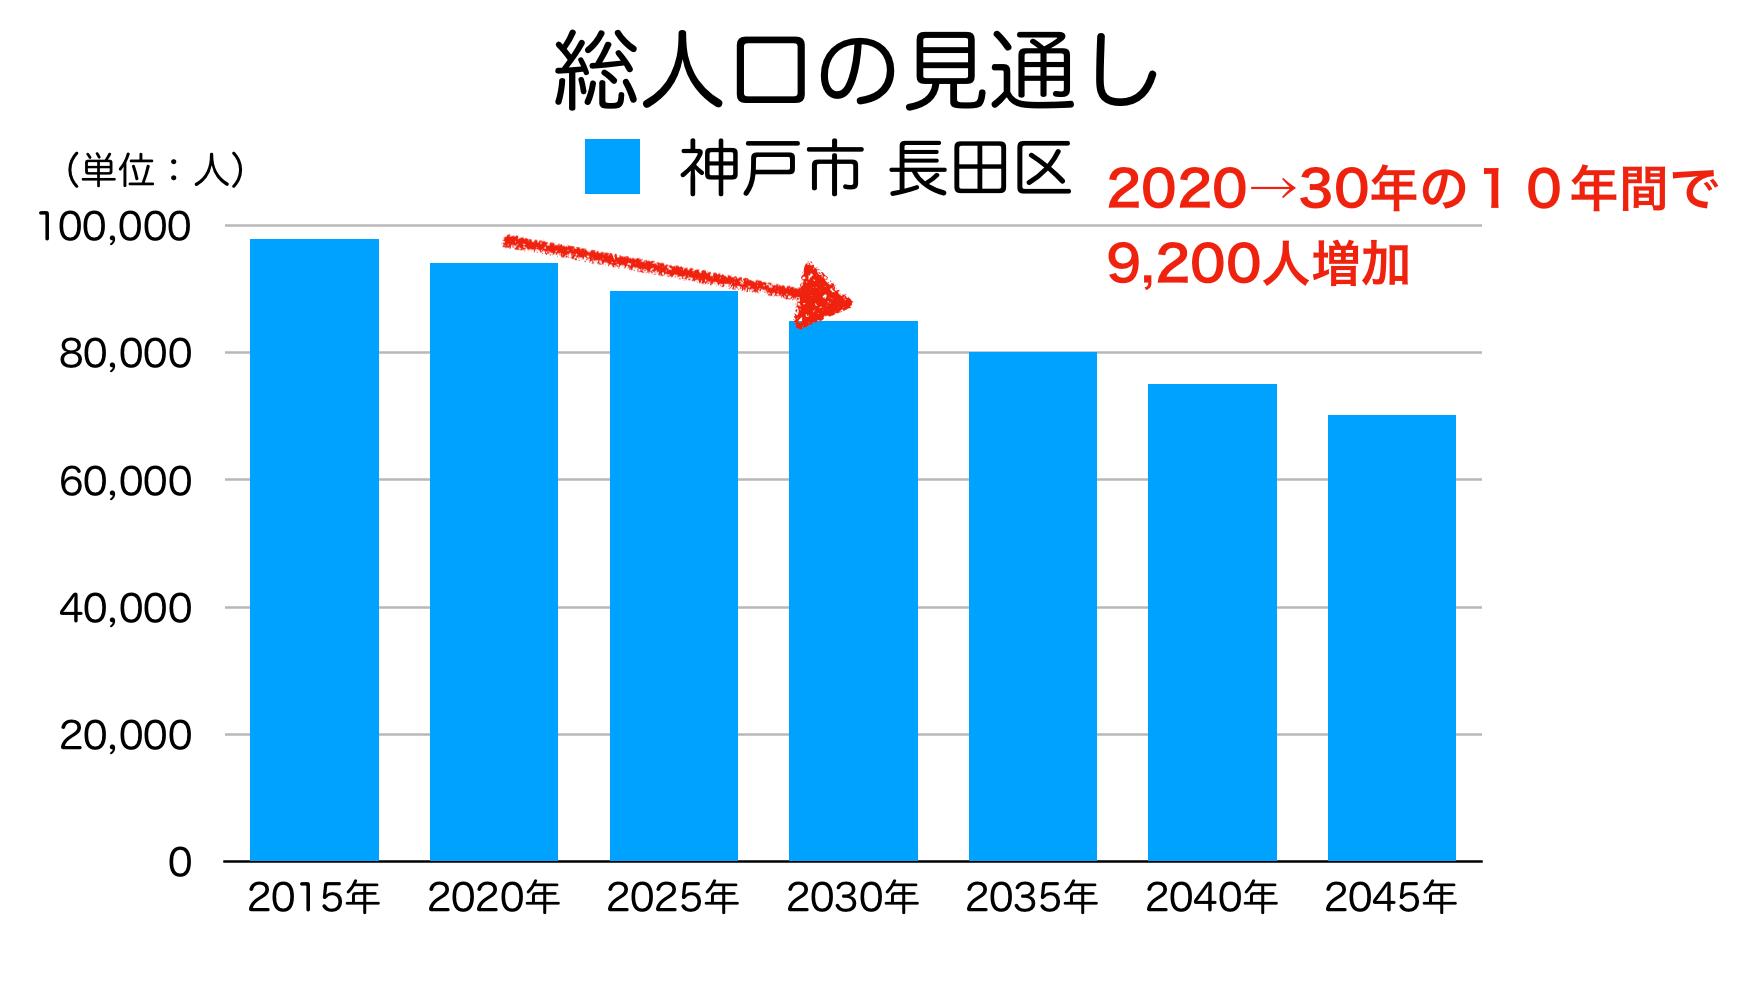 神戸市長田区の人口予測